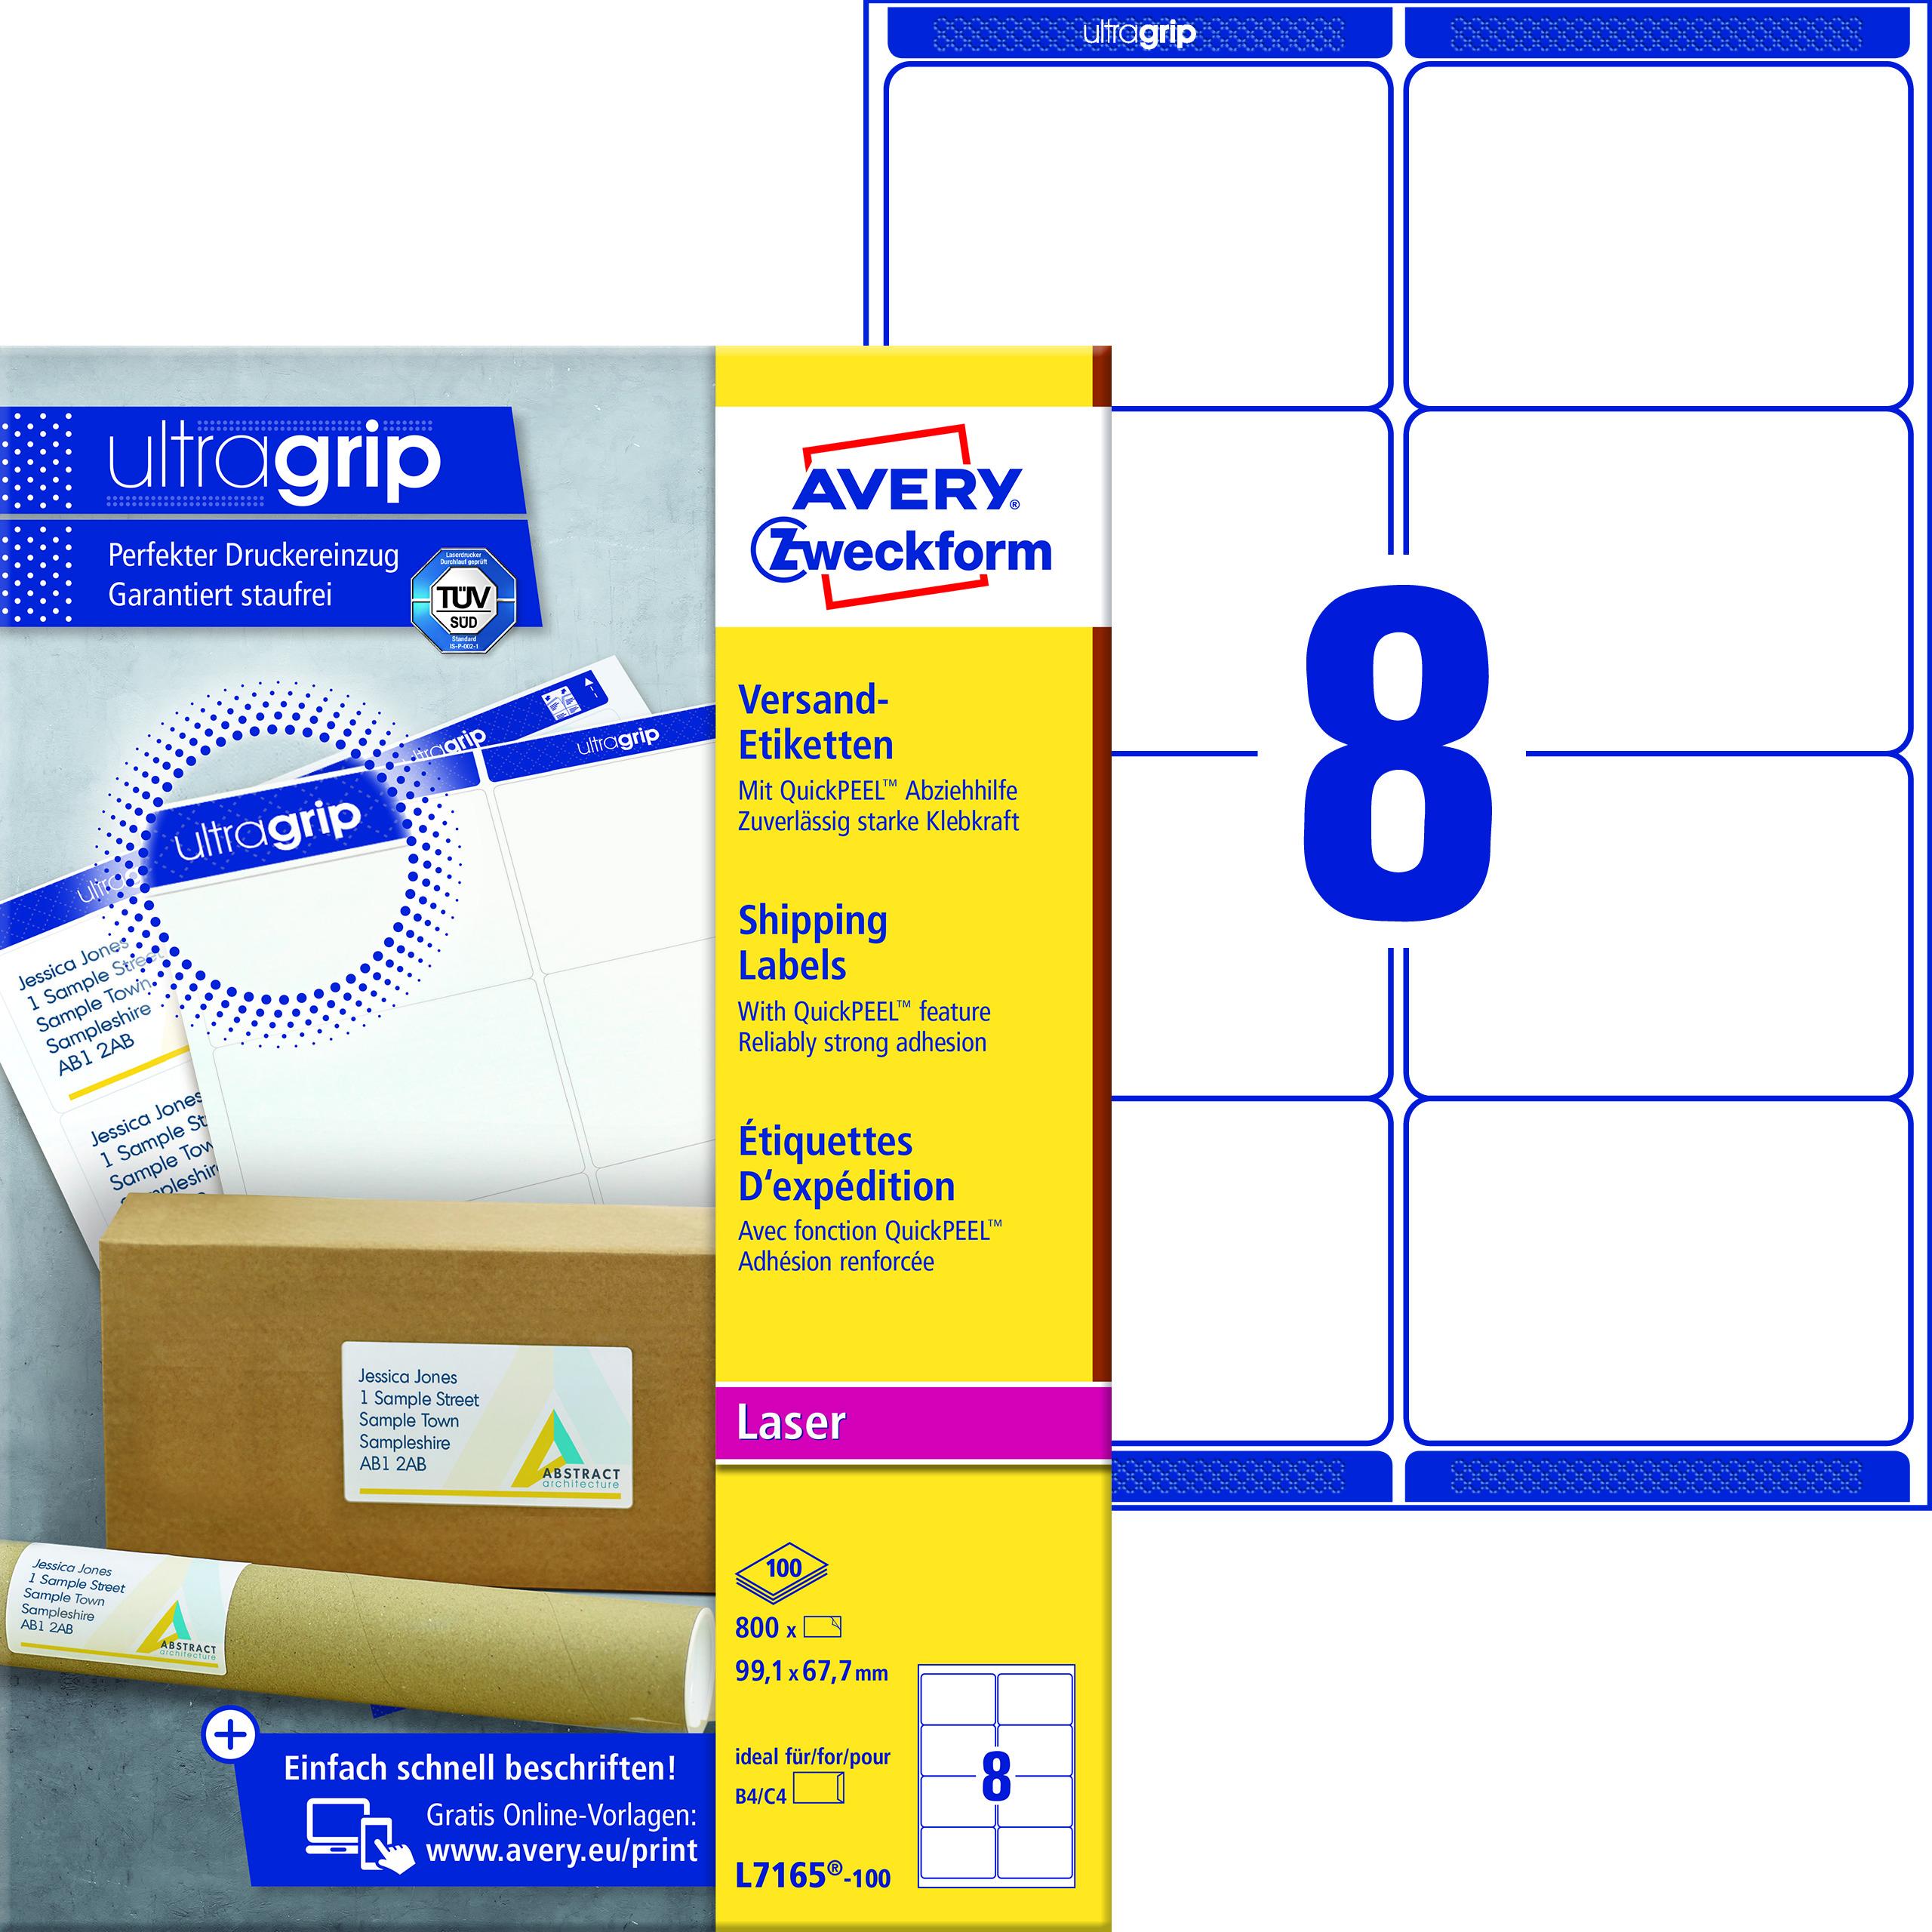 Avery L7165-100 Fraktetiketter 99,1x67,7 QP+UG (800)